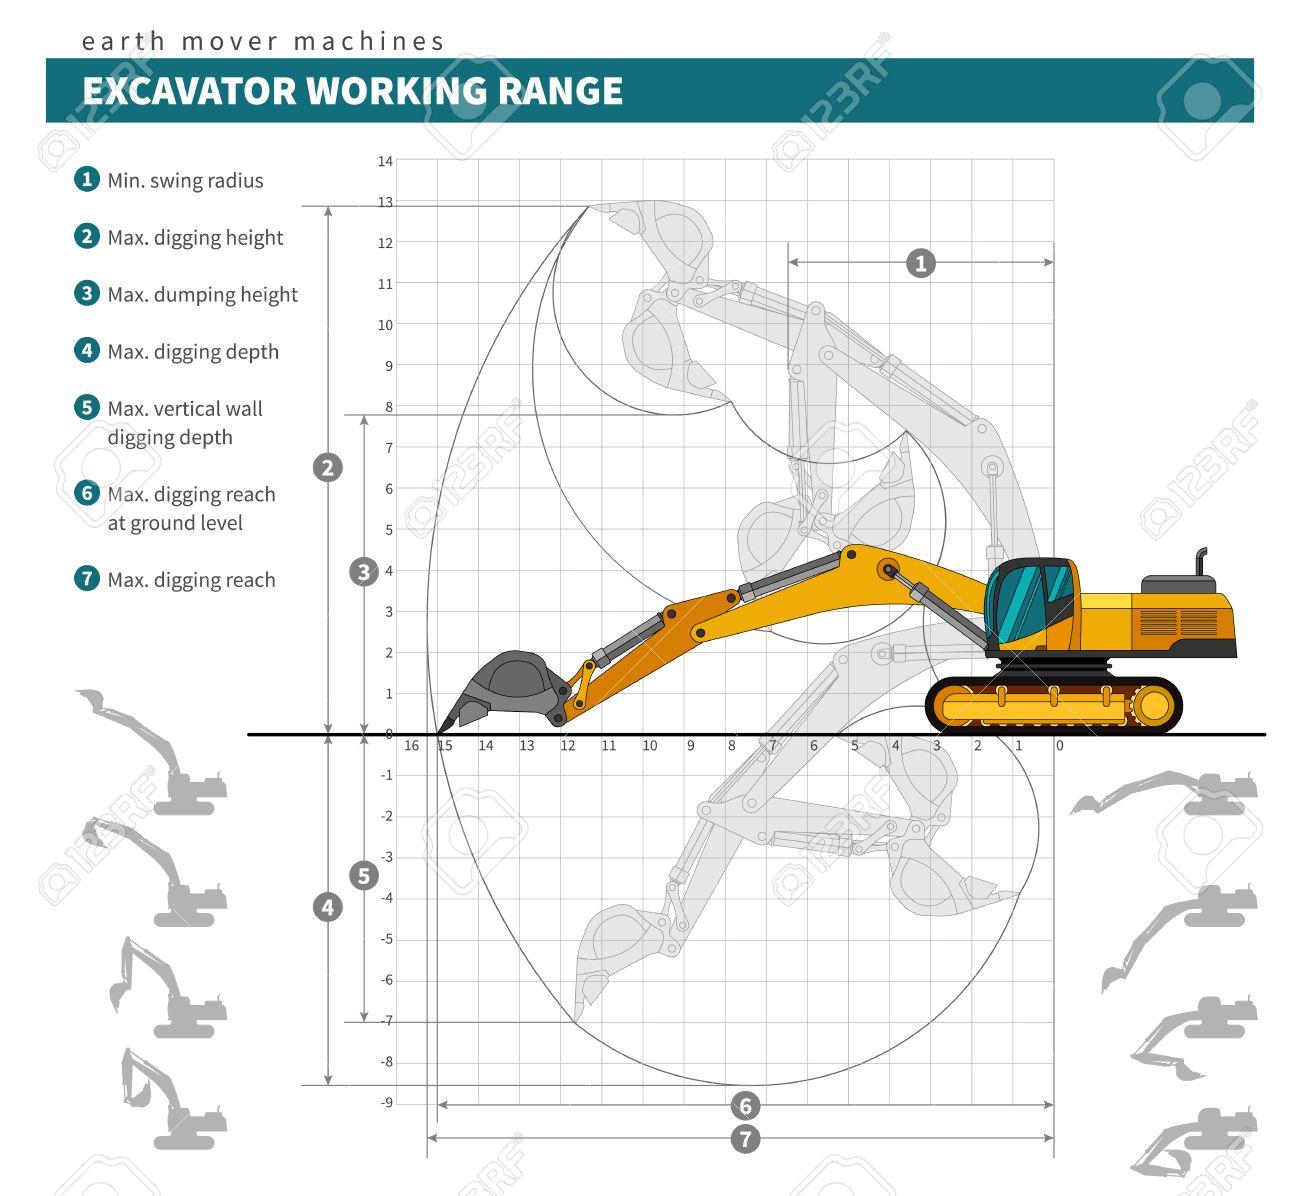 Excavator working range technical drawing blueprint  Heavy equipment